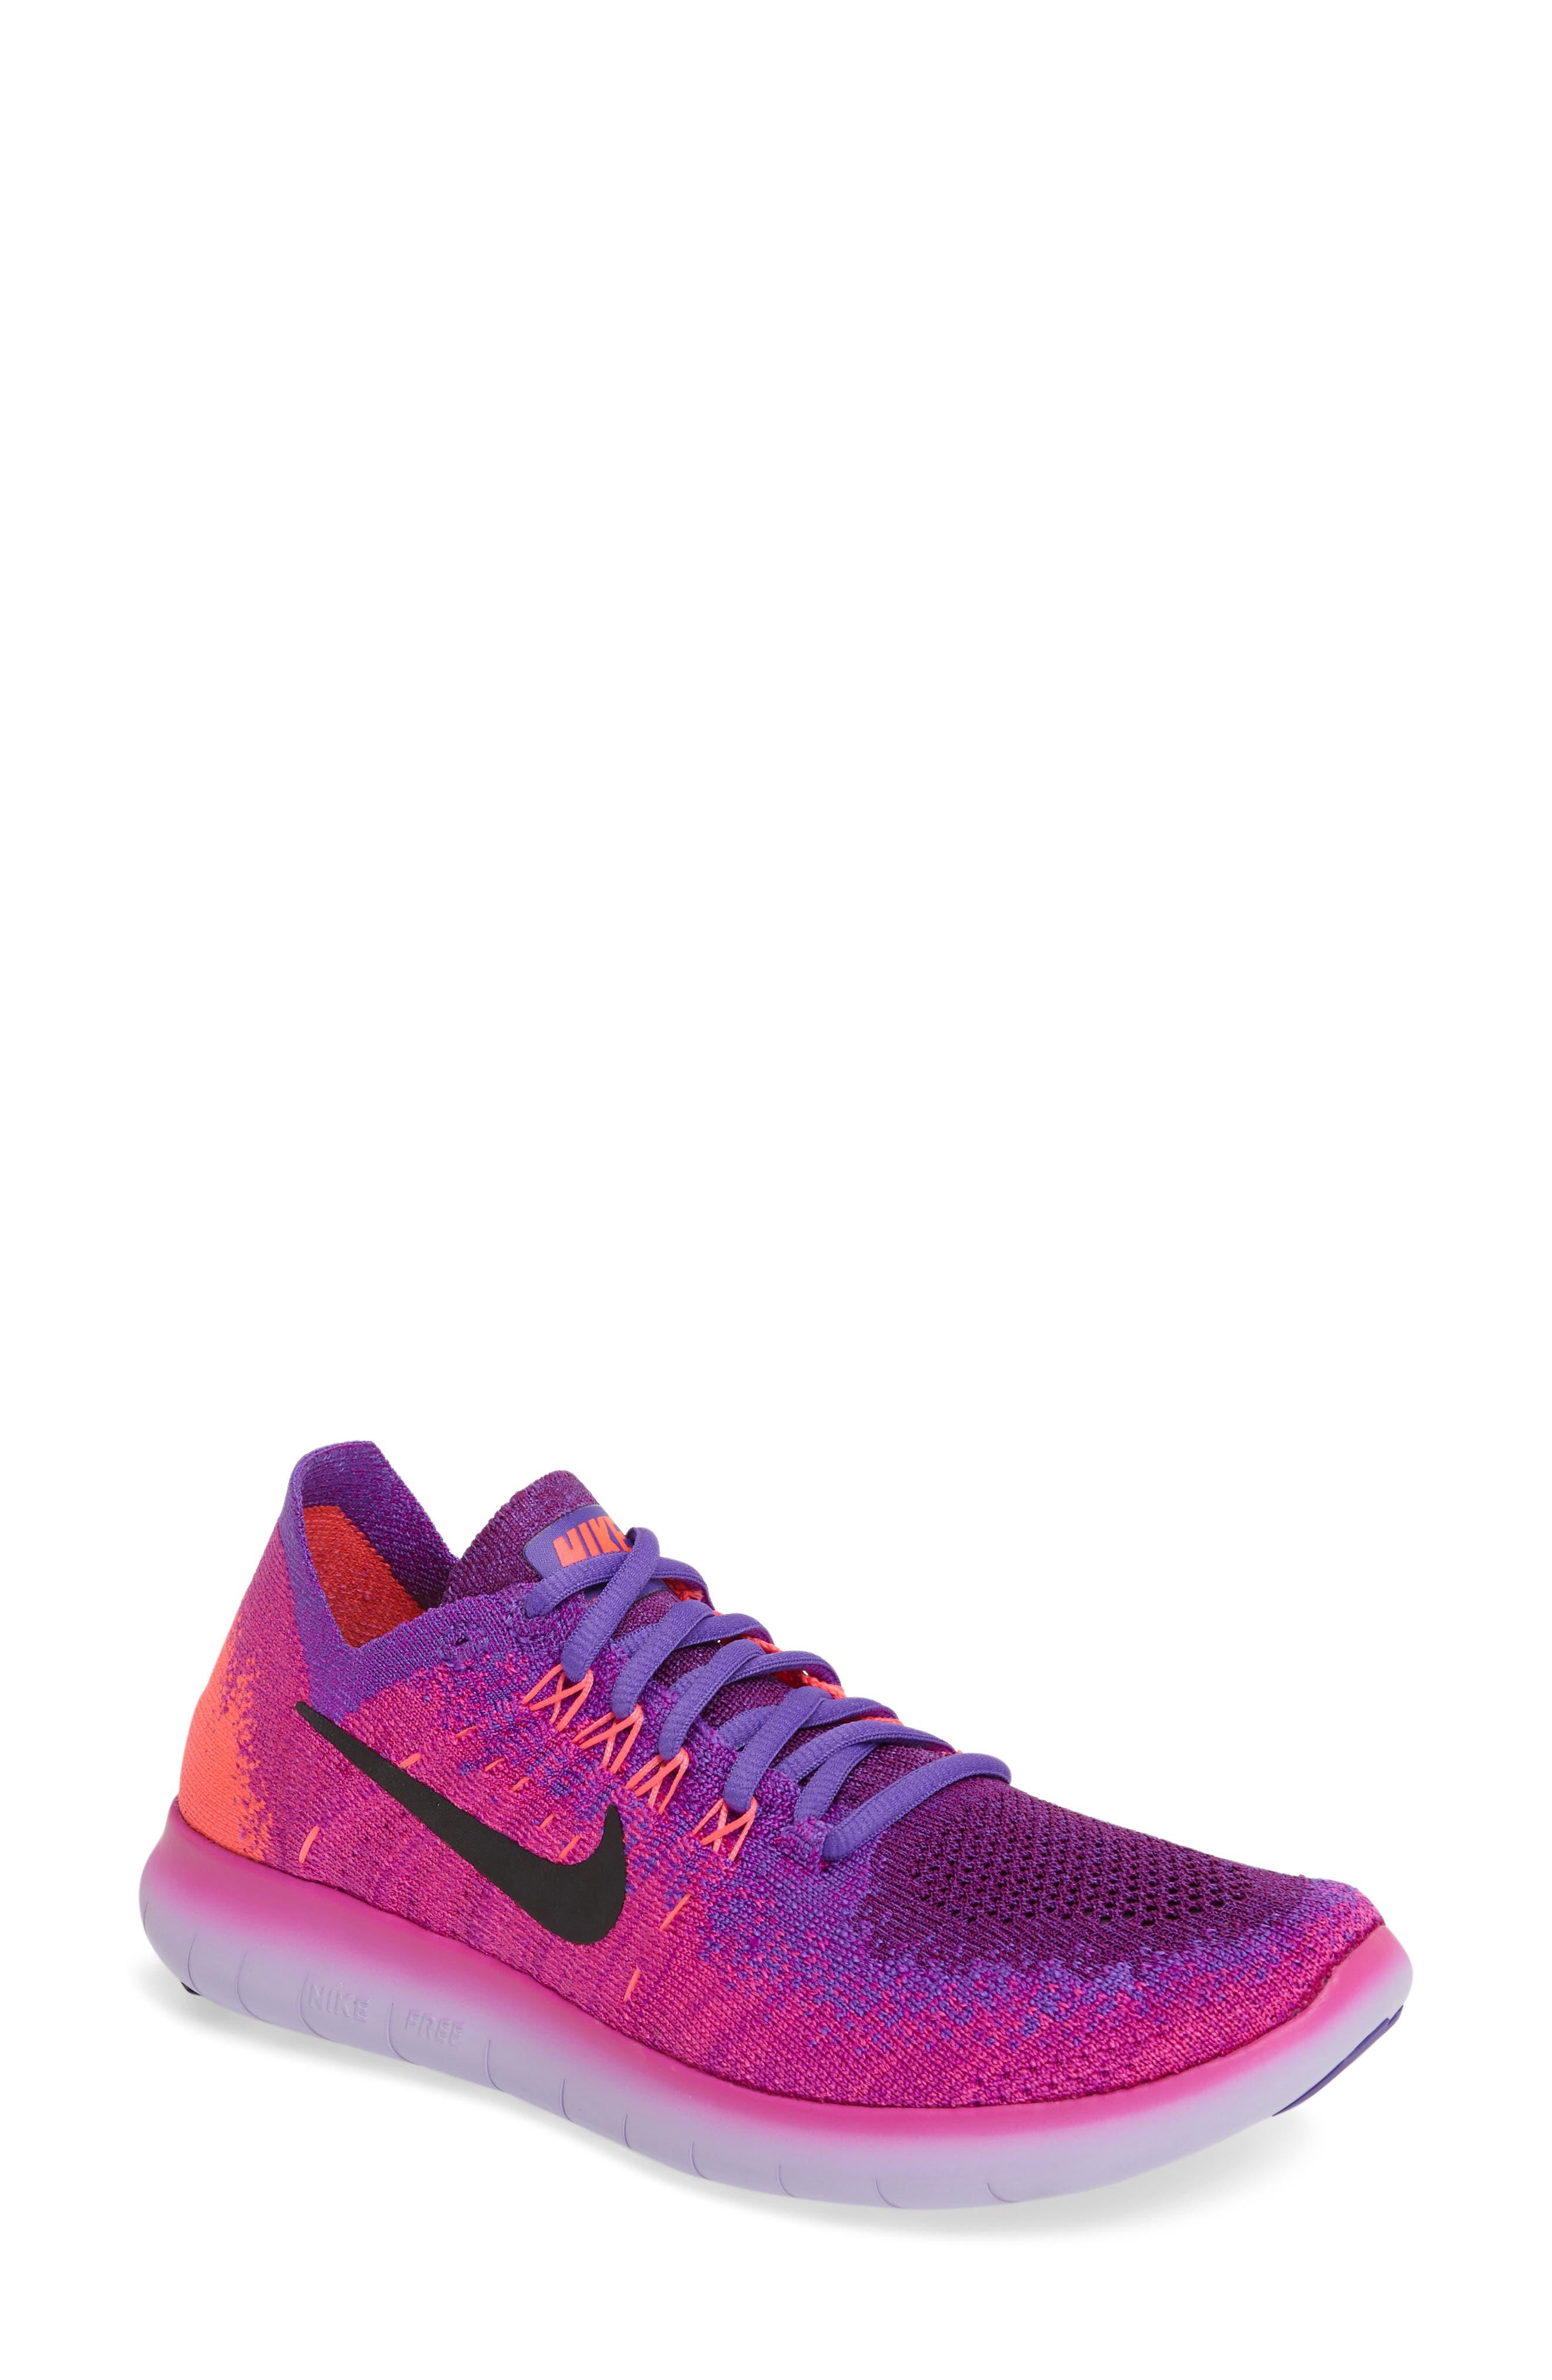 Main Image - Nike Free RN Flyknit 2 Running Shoe (Women)